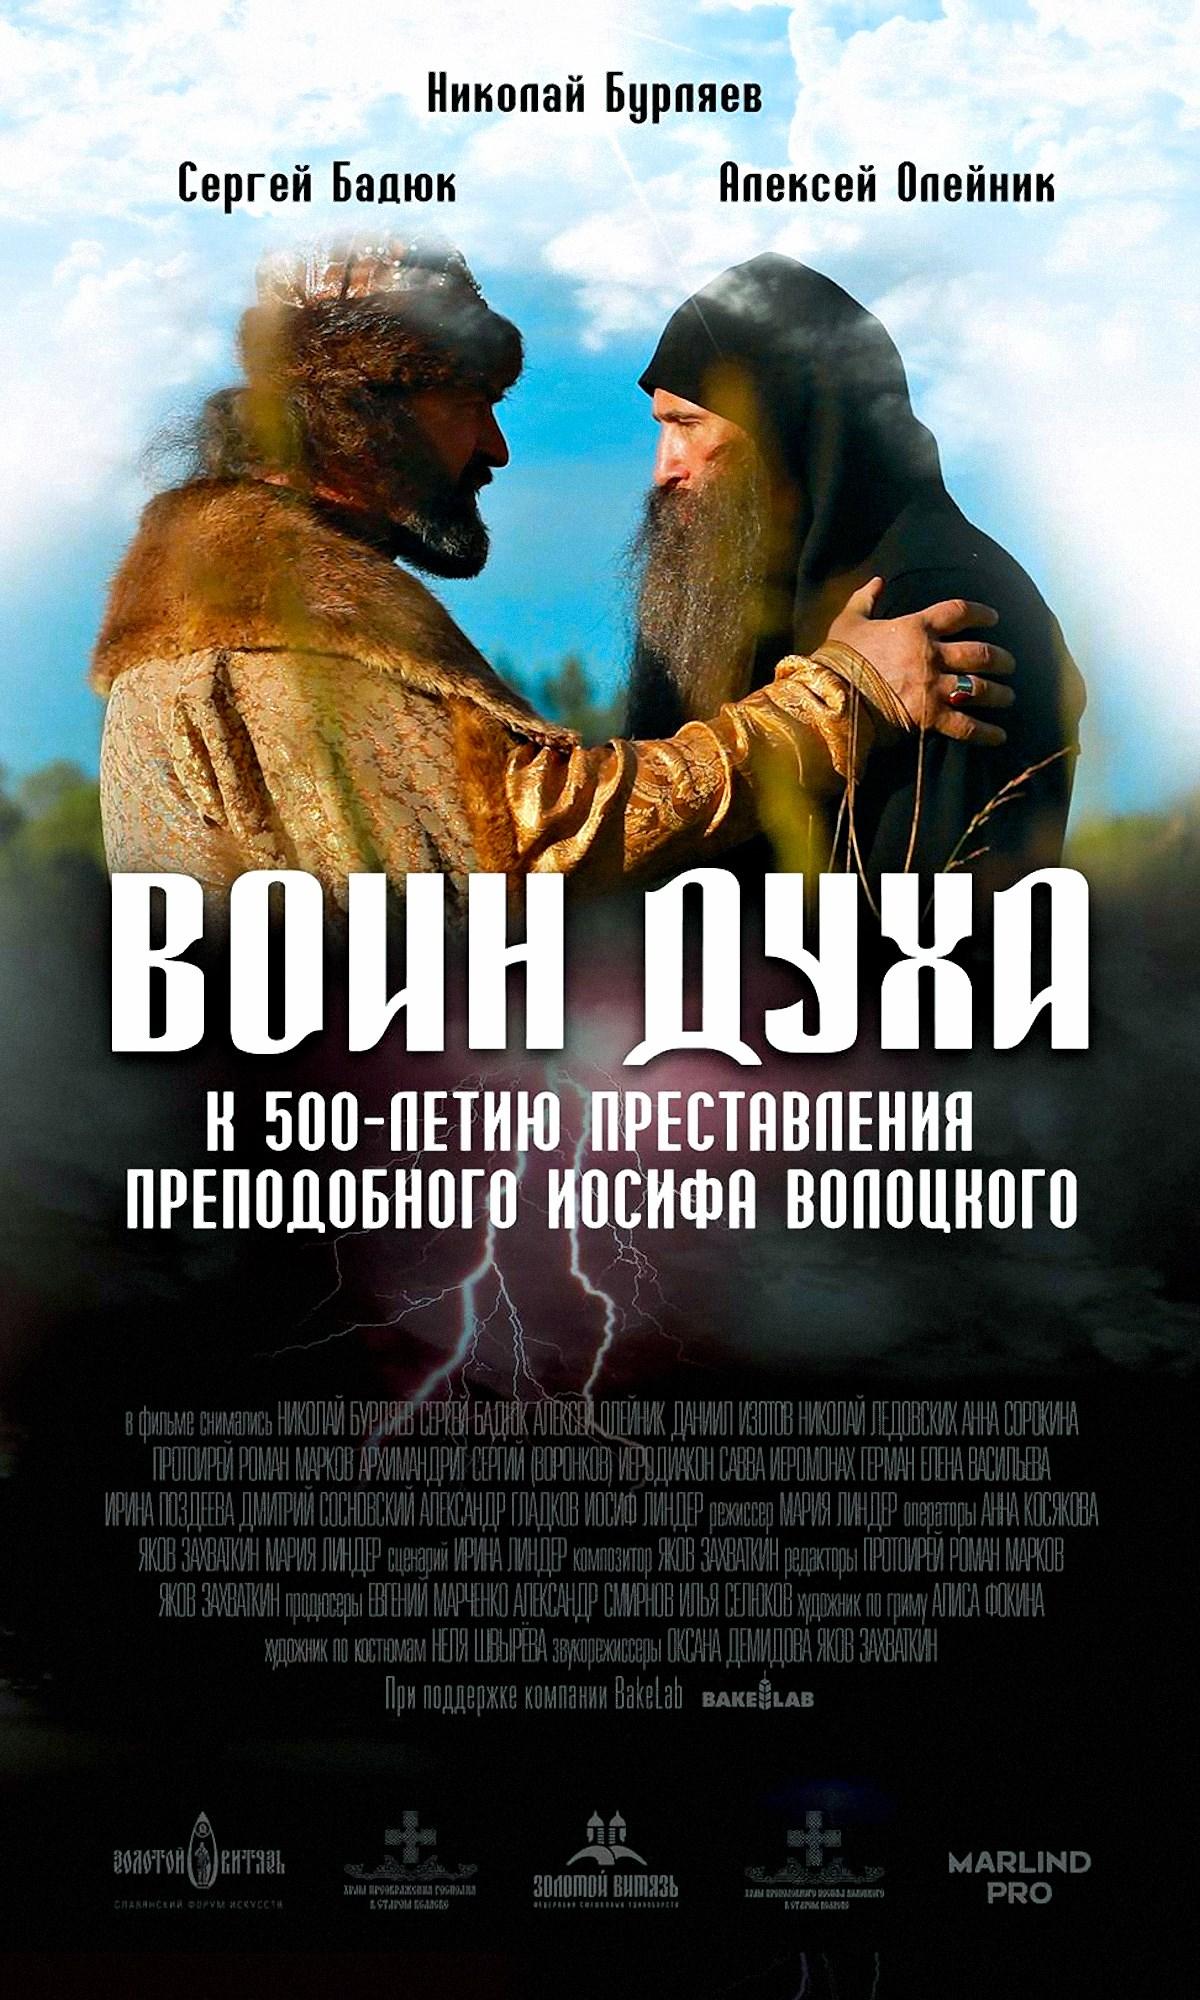 19 may 2016 a new russian film� �spiritual warrior� a